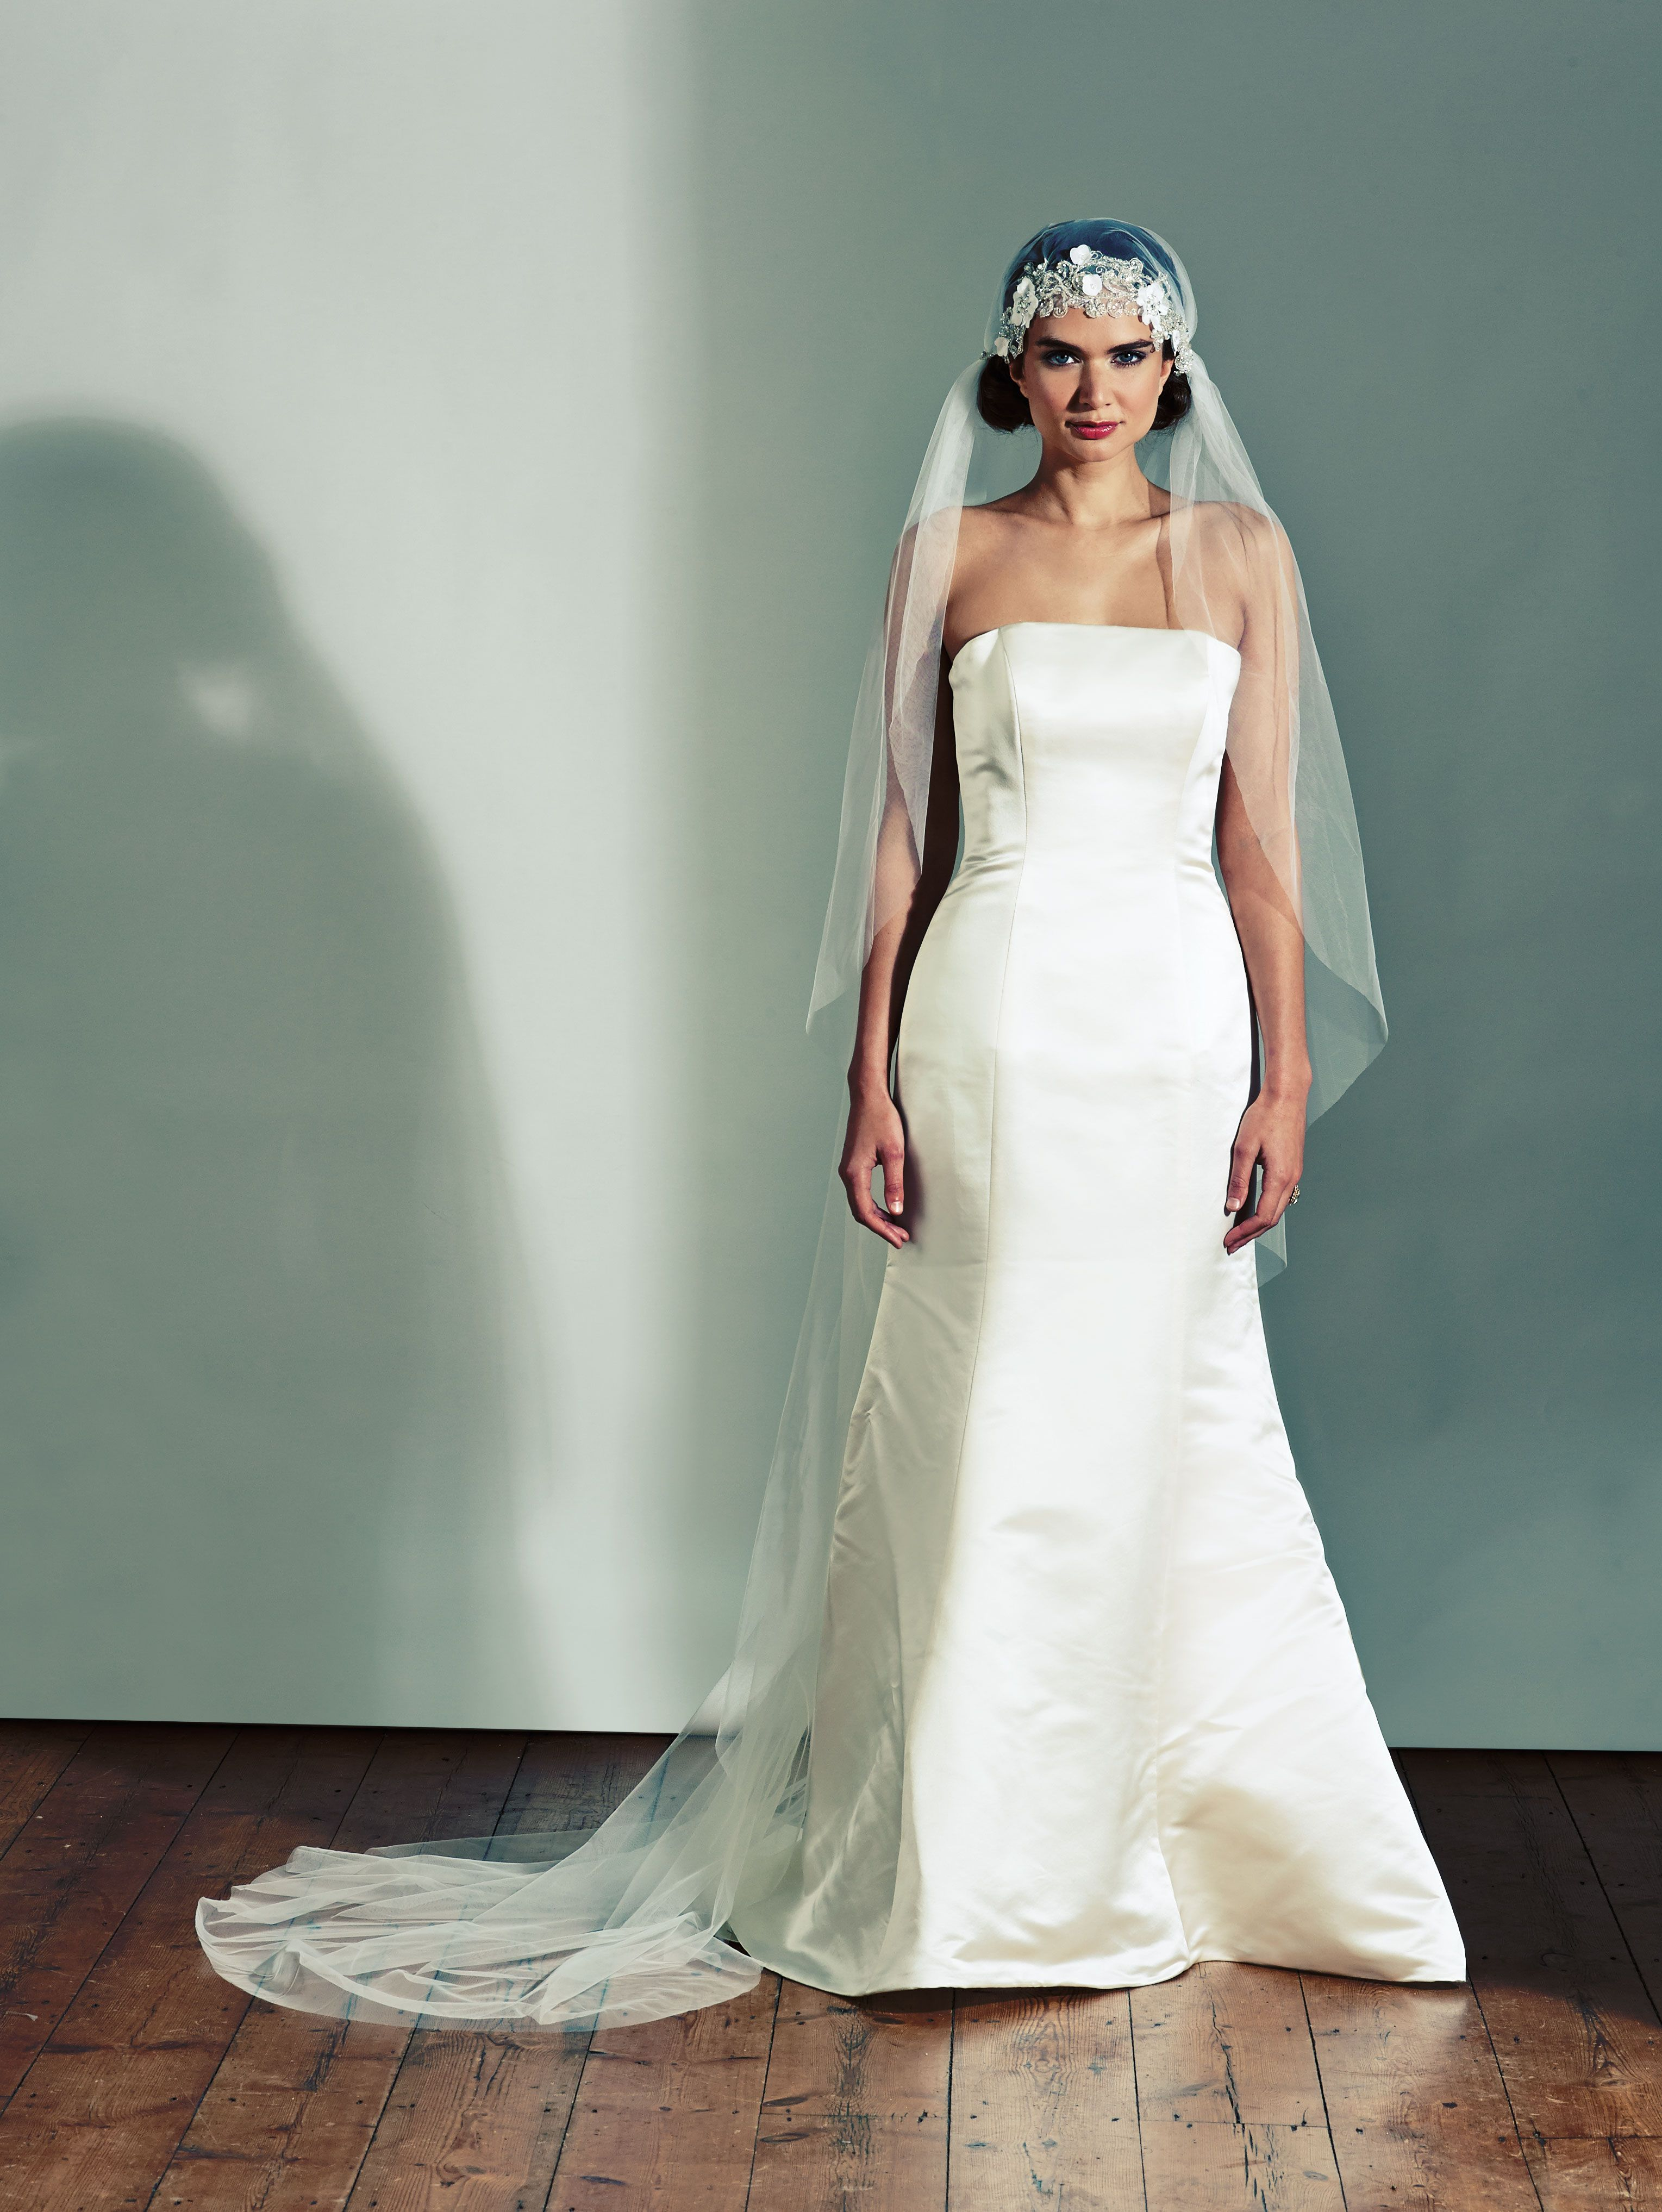 Joyce jackson nefyn wedding veil a boho style italian tulle veil